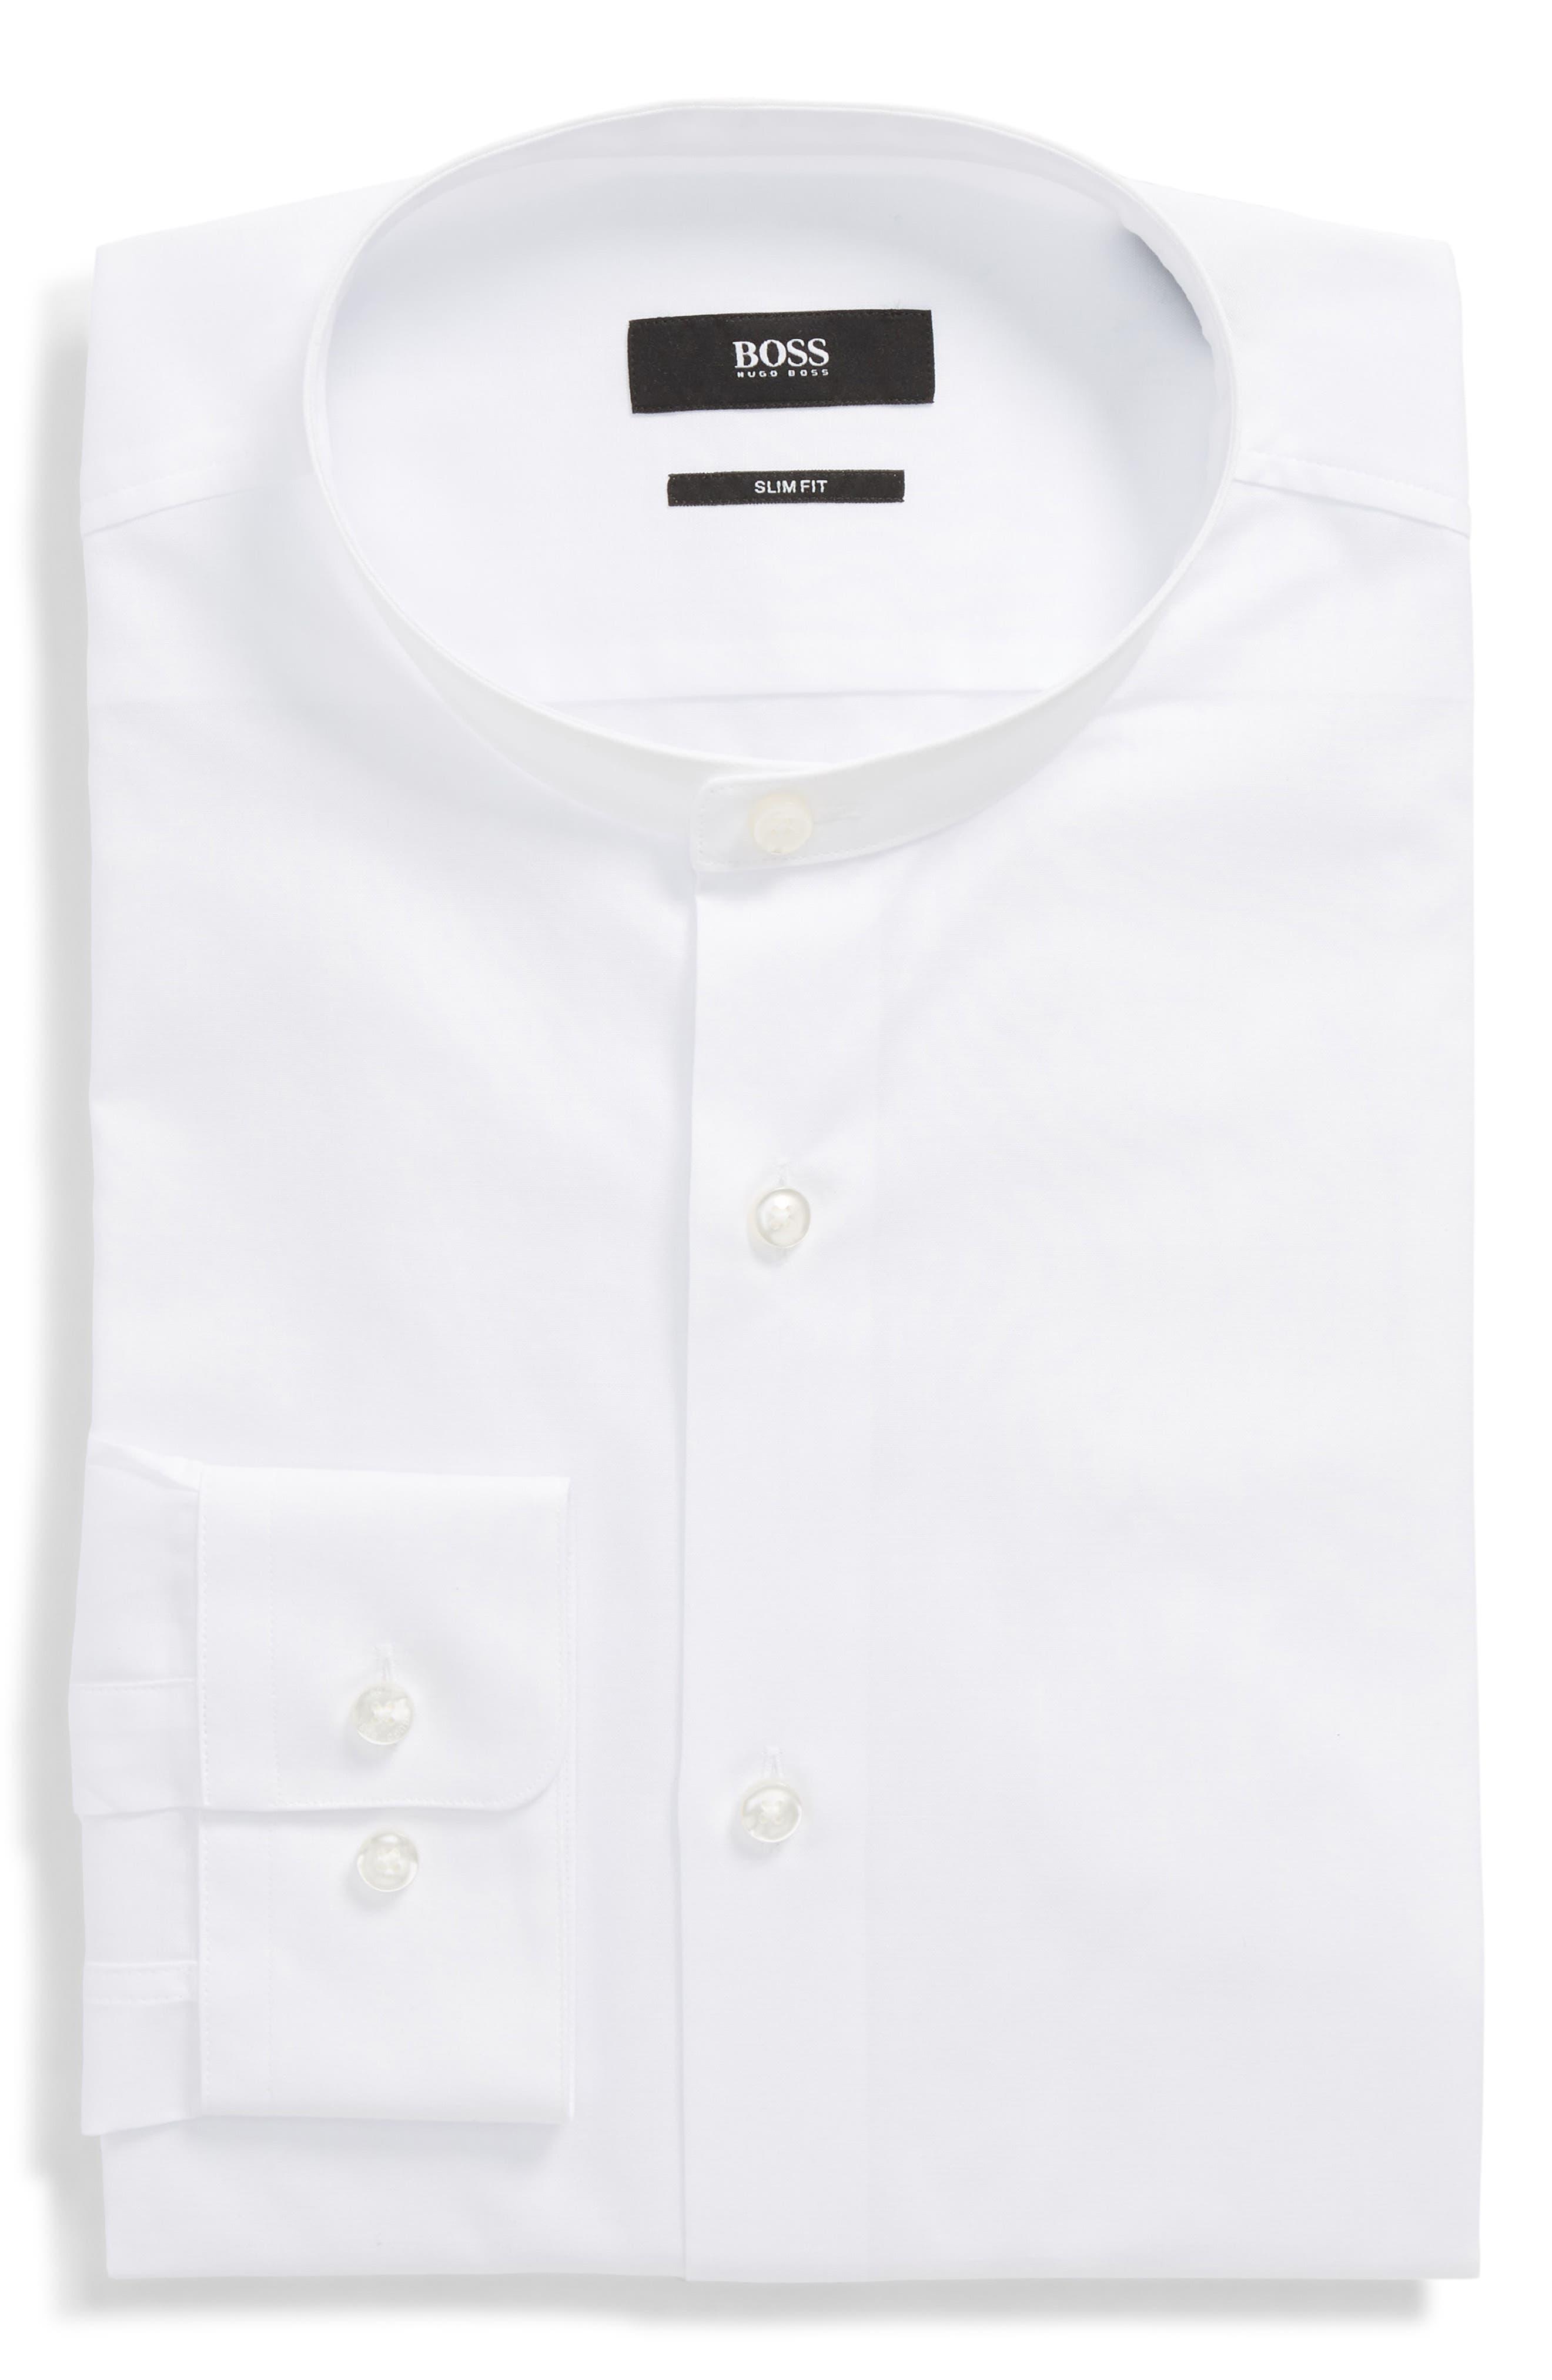 Jordi Slim Fit Solid Band Collar Dress Shirt,                             Main thumbnail 1, color,